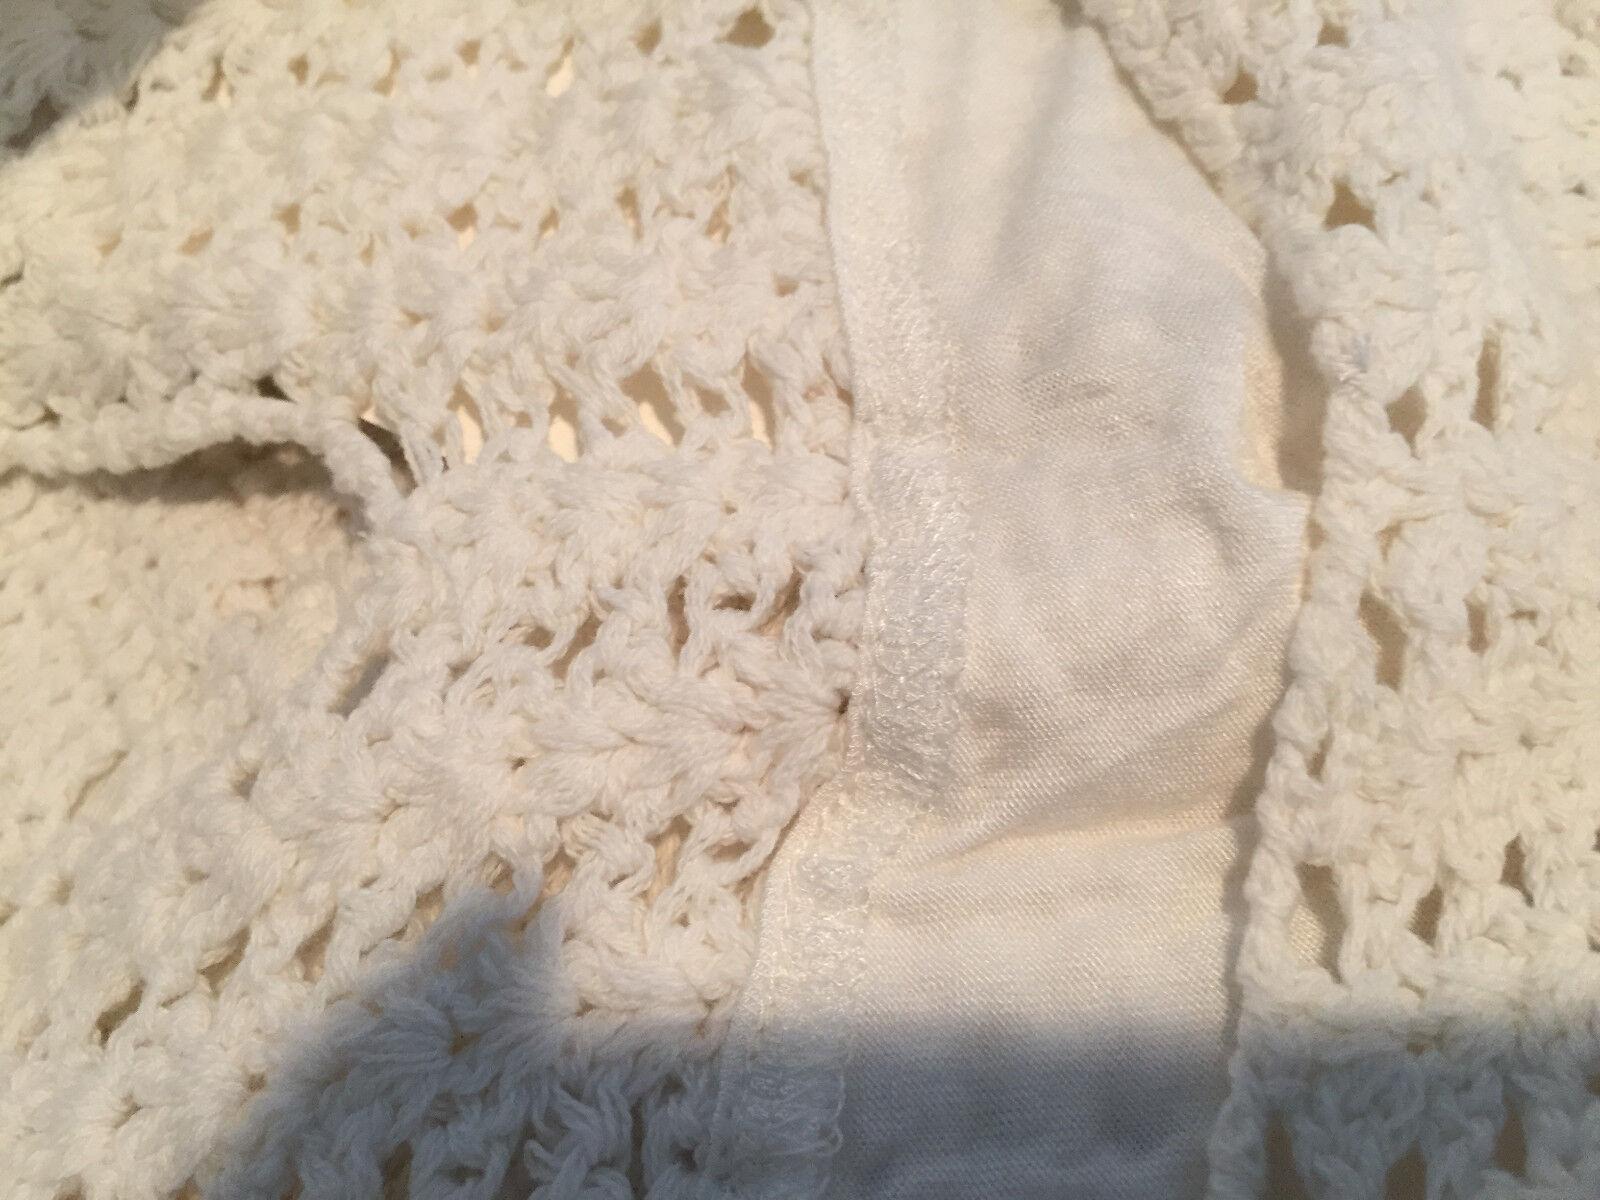 NWT  398 JOIE 'Xael' Crochet Sleeveless Midi Dress, Dress, Dress, Porcelain, Small GORGEOUS 28c3c3